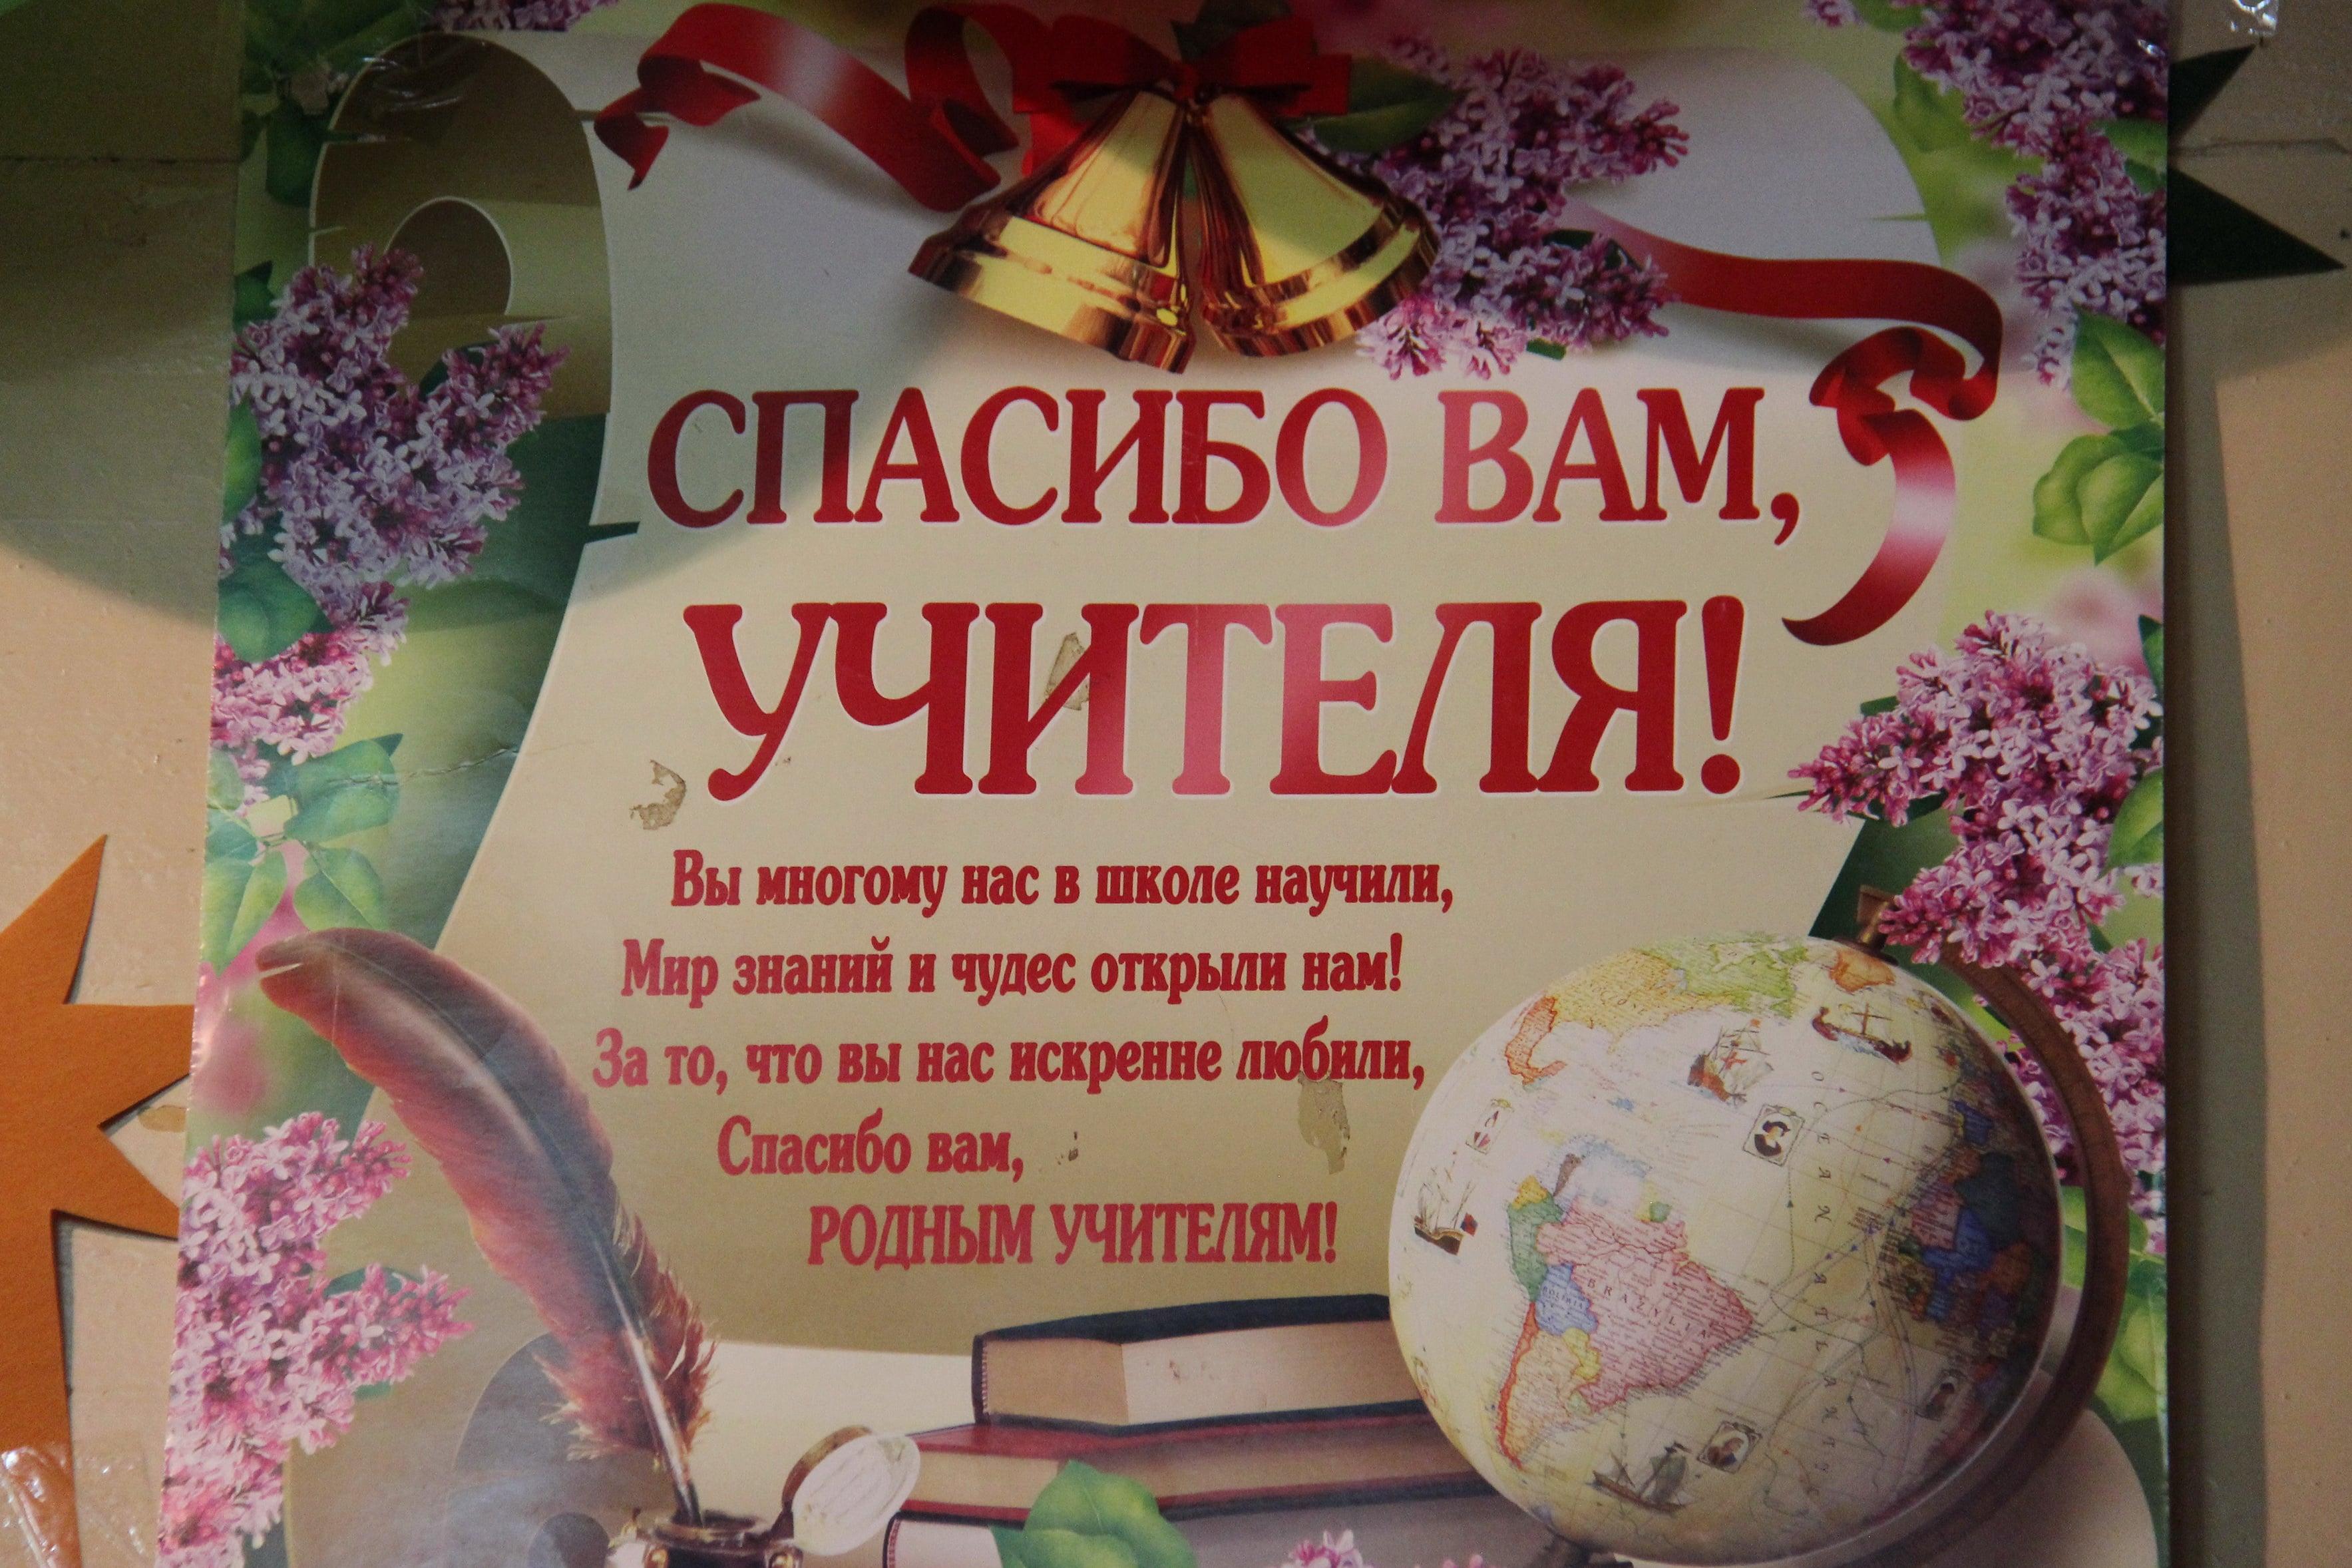 http://monuspen.ru/photoreports/f99f36fb8c0615660f656fe4f1b72c7g.JPG